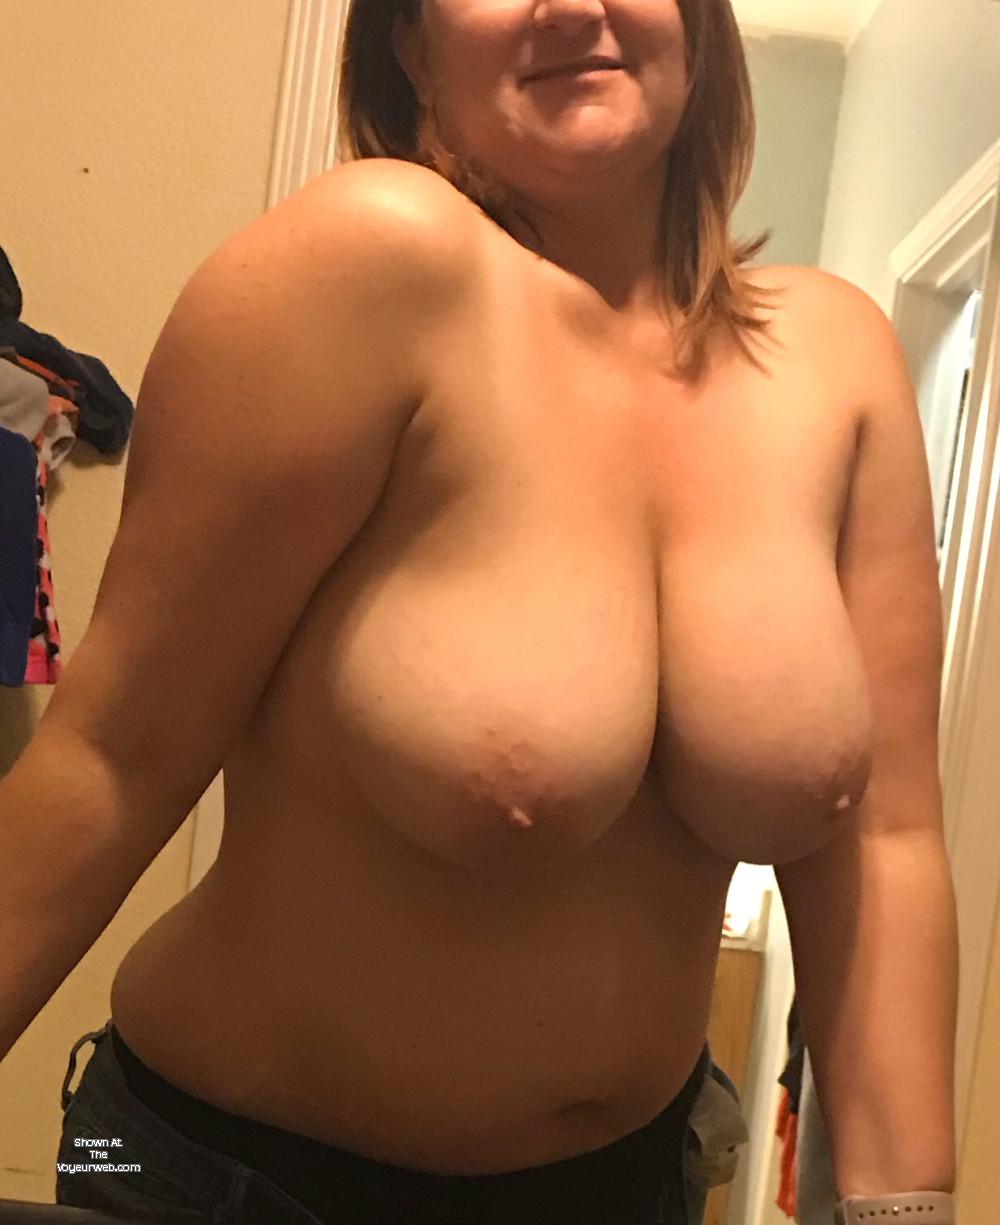 Cute drunk nude girls